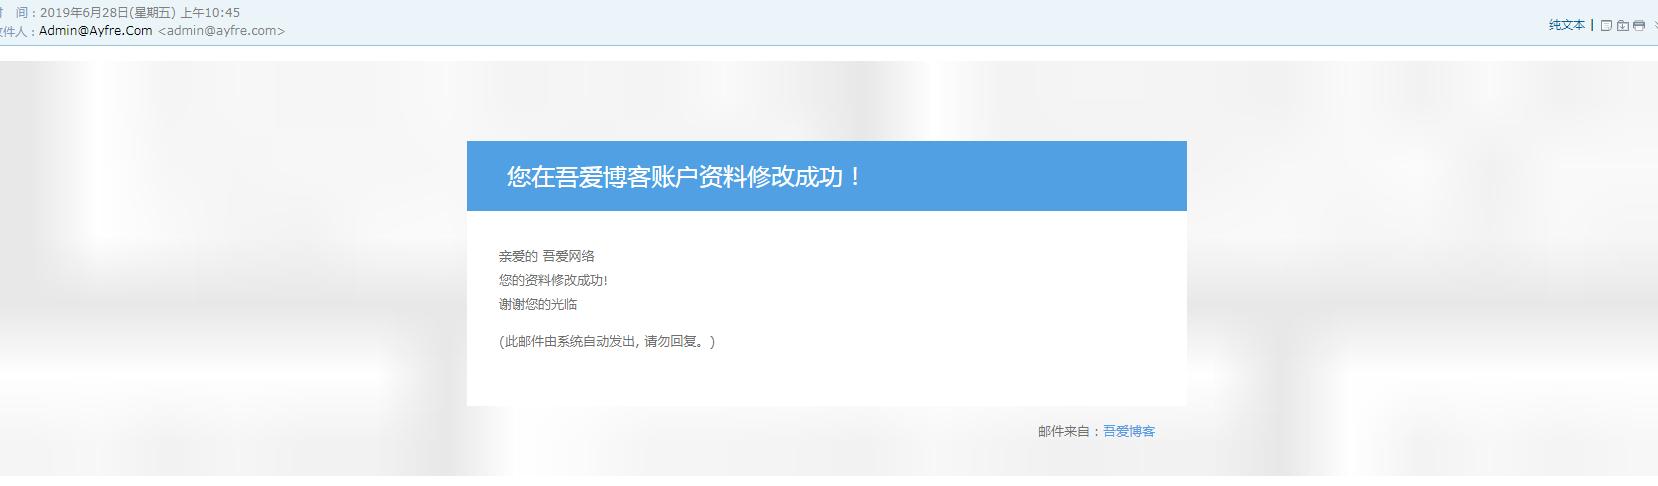 WordPress用户信息更新时发送通知邮件